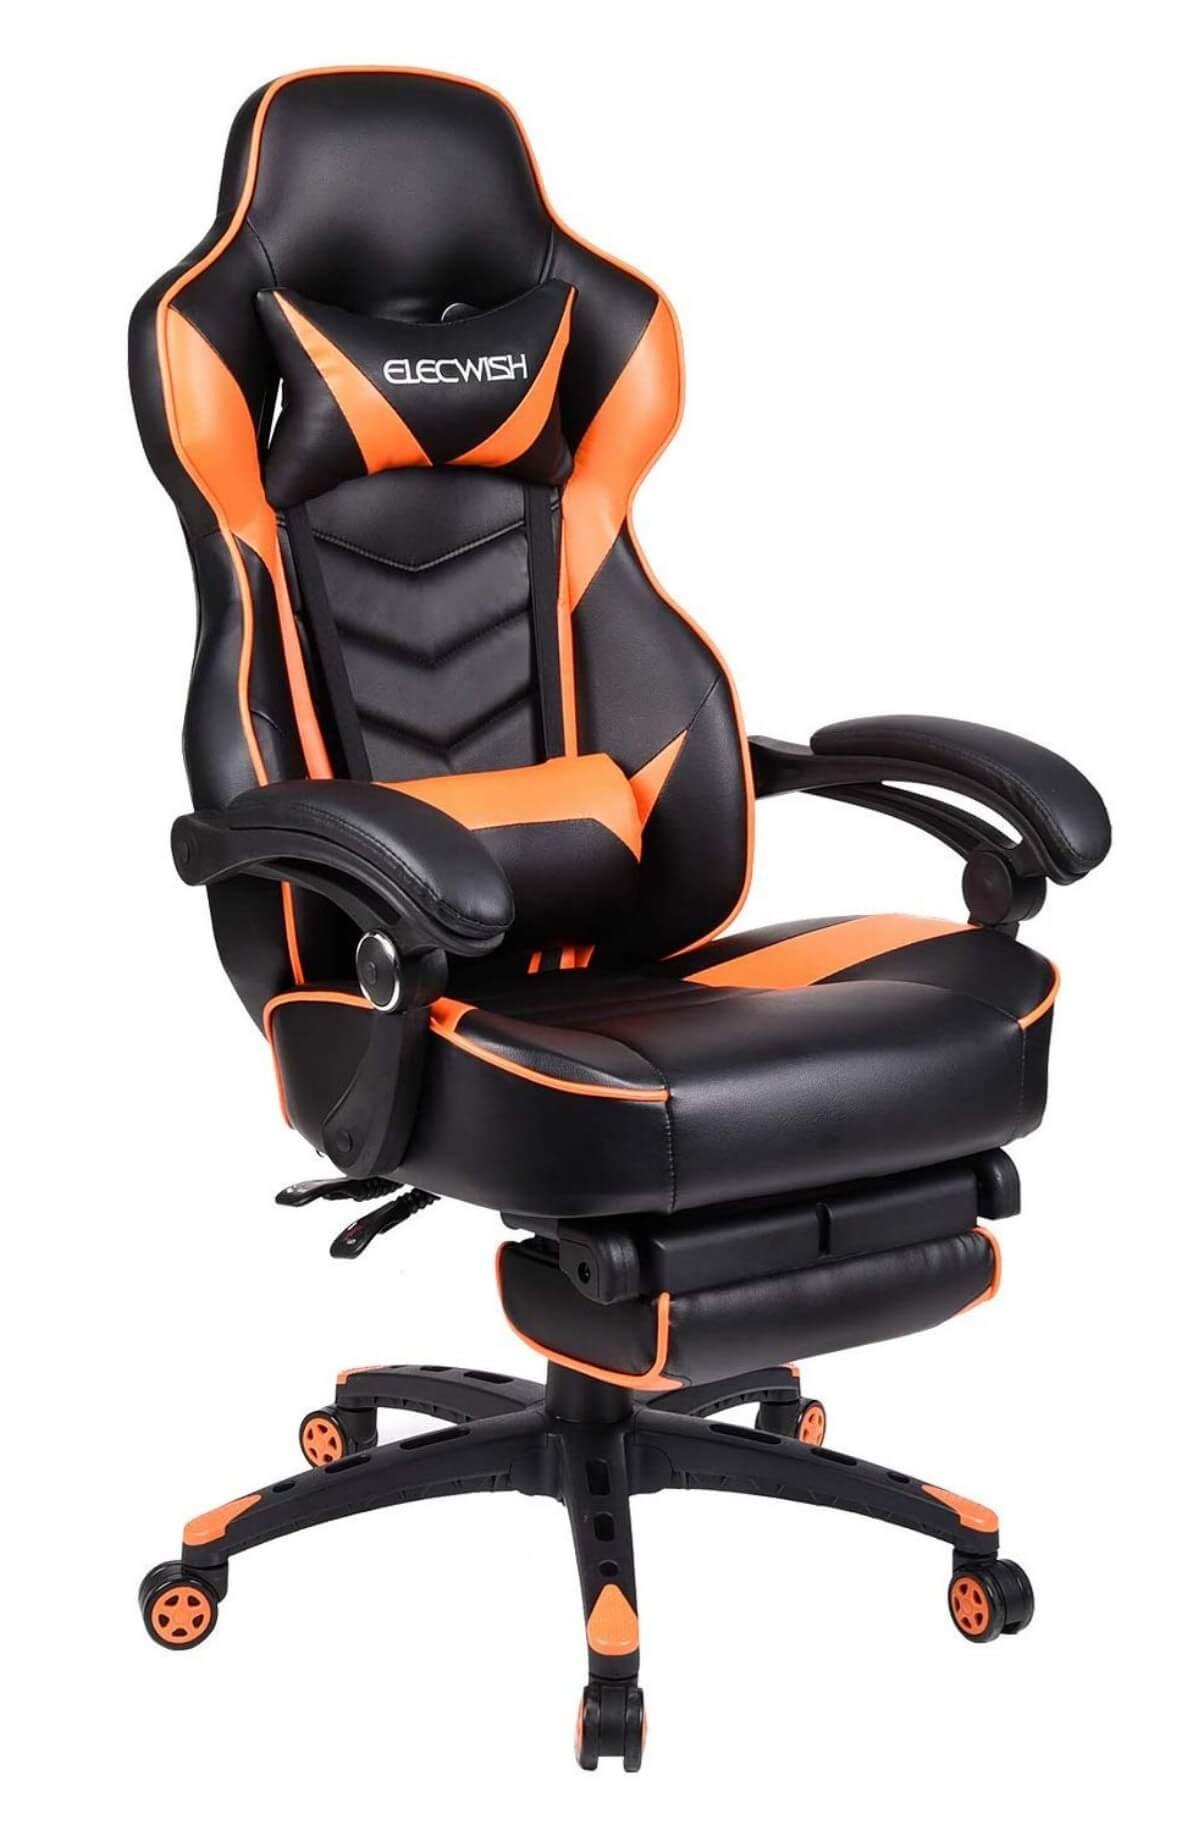 elecwish standard model chair